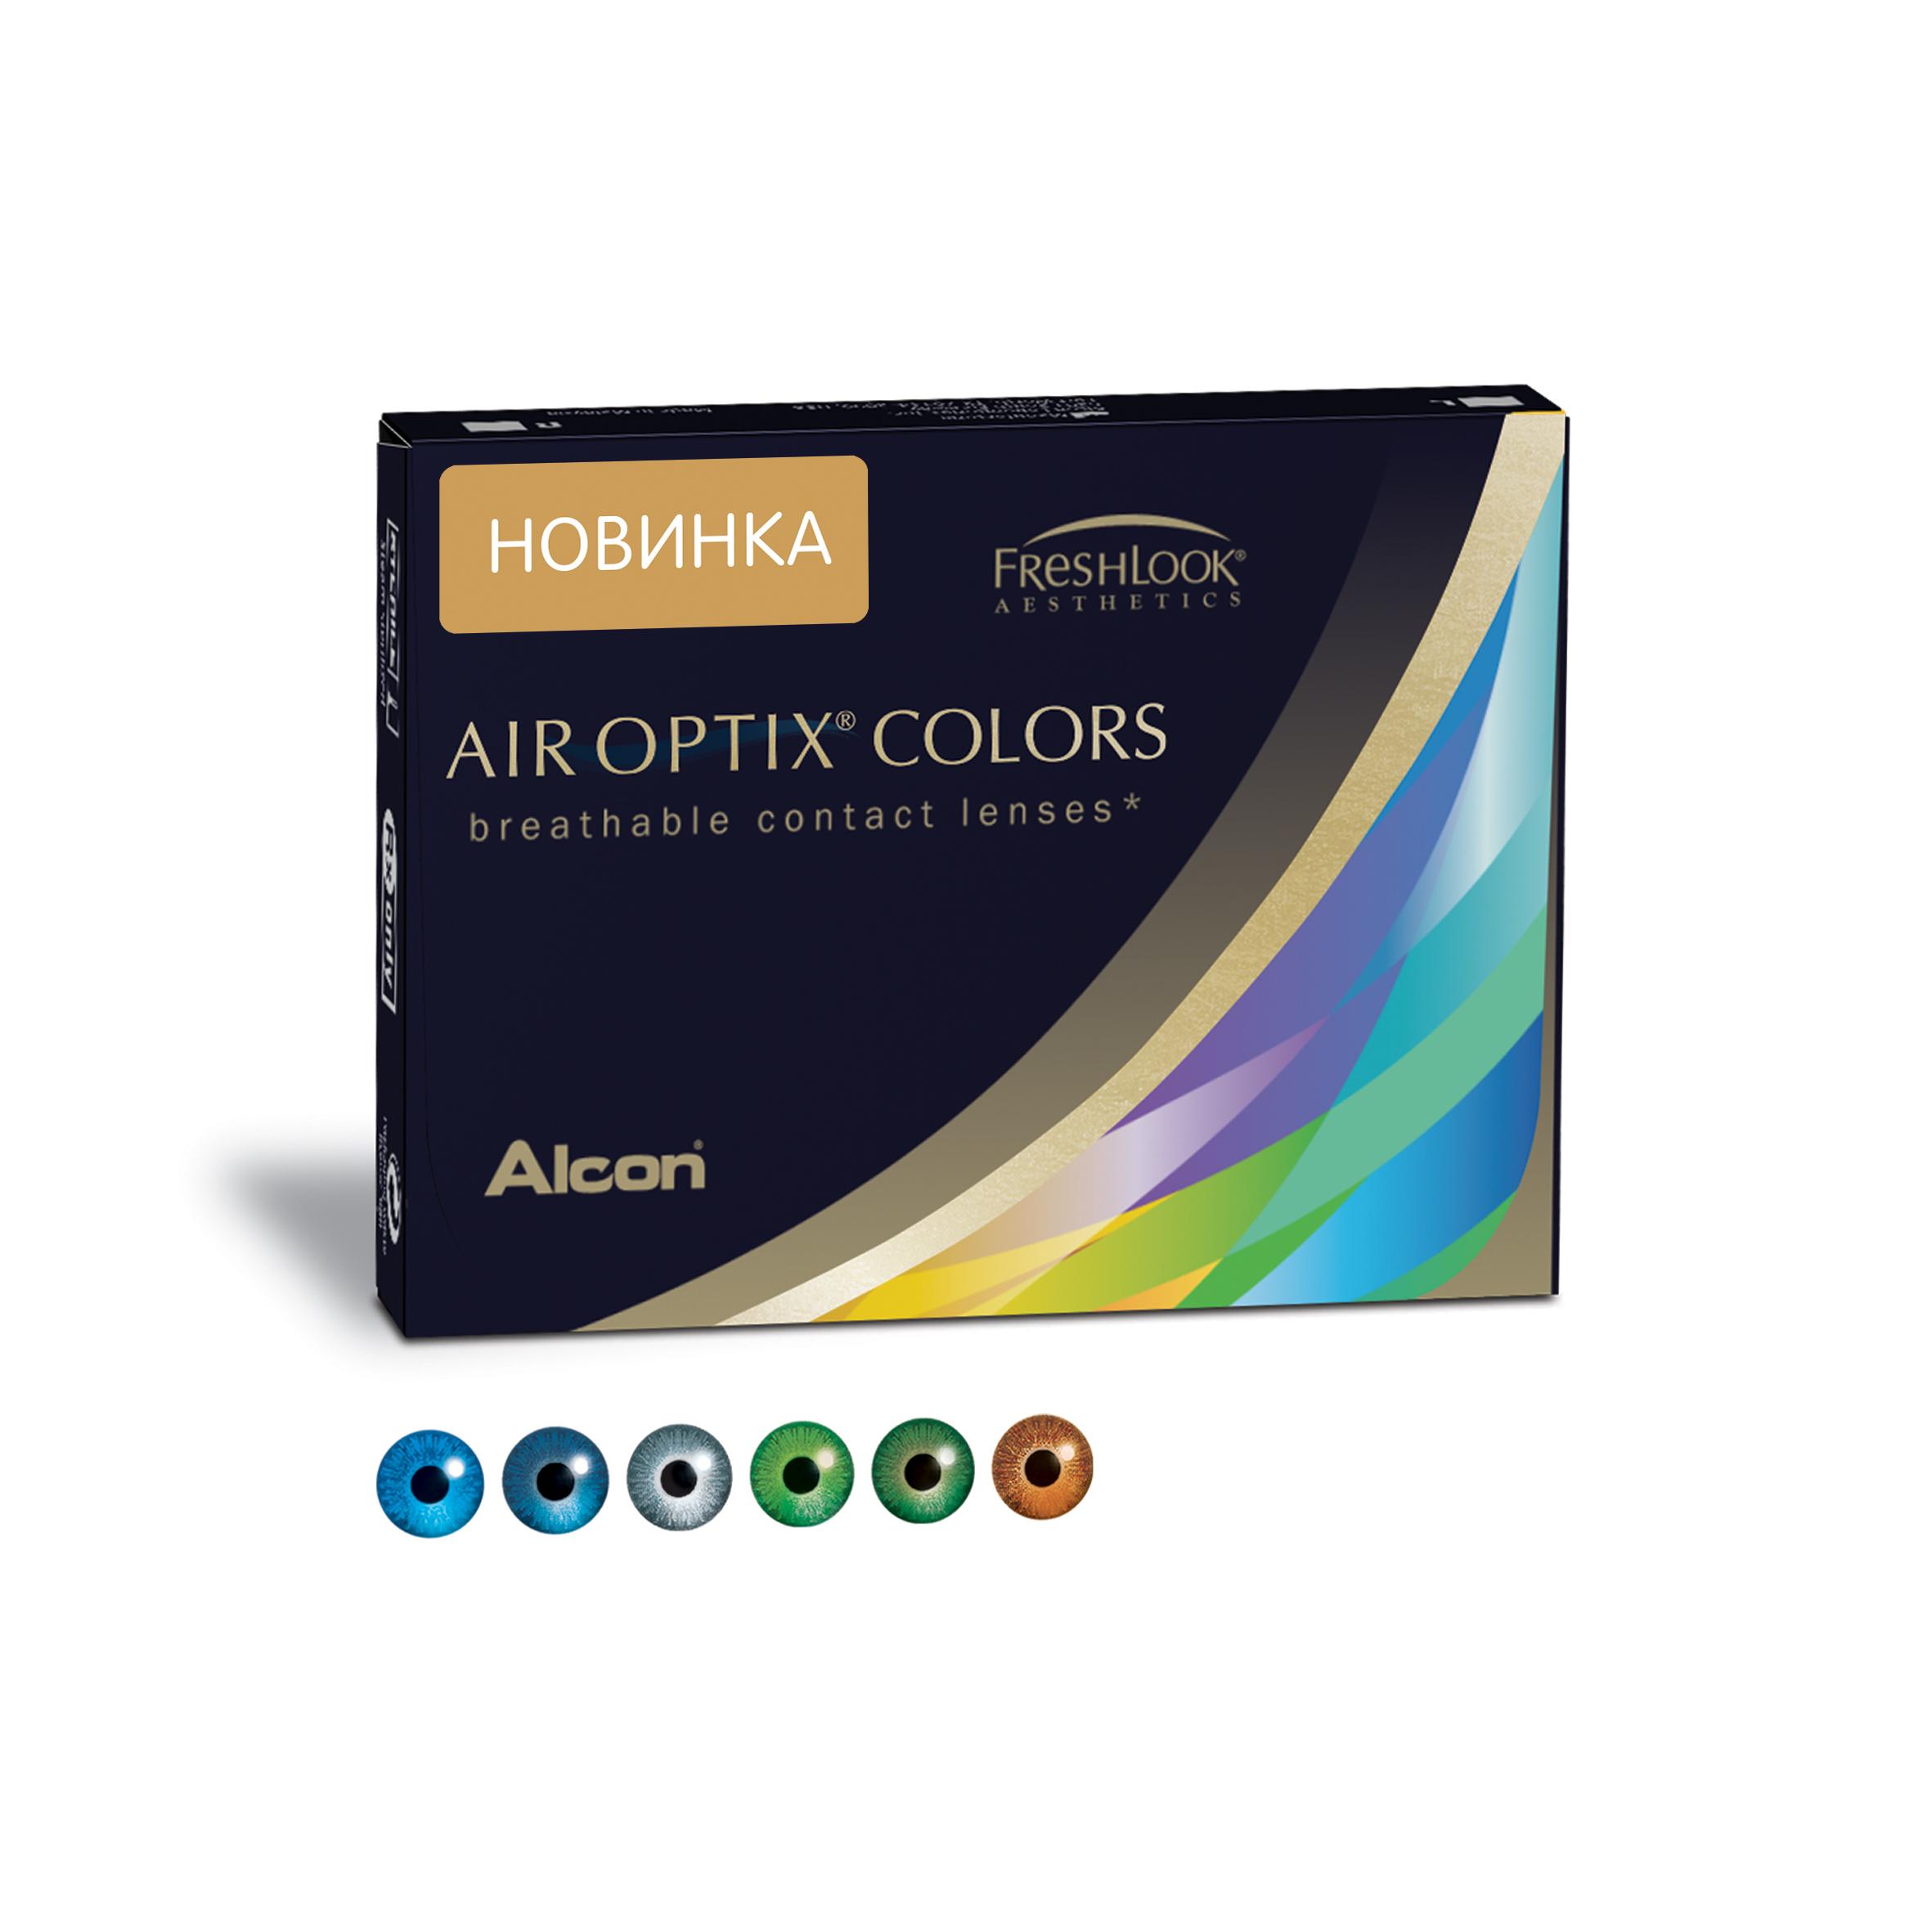 Аlcon контактные линзы Air Optix Colors 2 шт -6.00 Honey31746307Мягкие контактные линзы